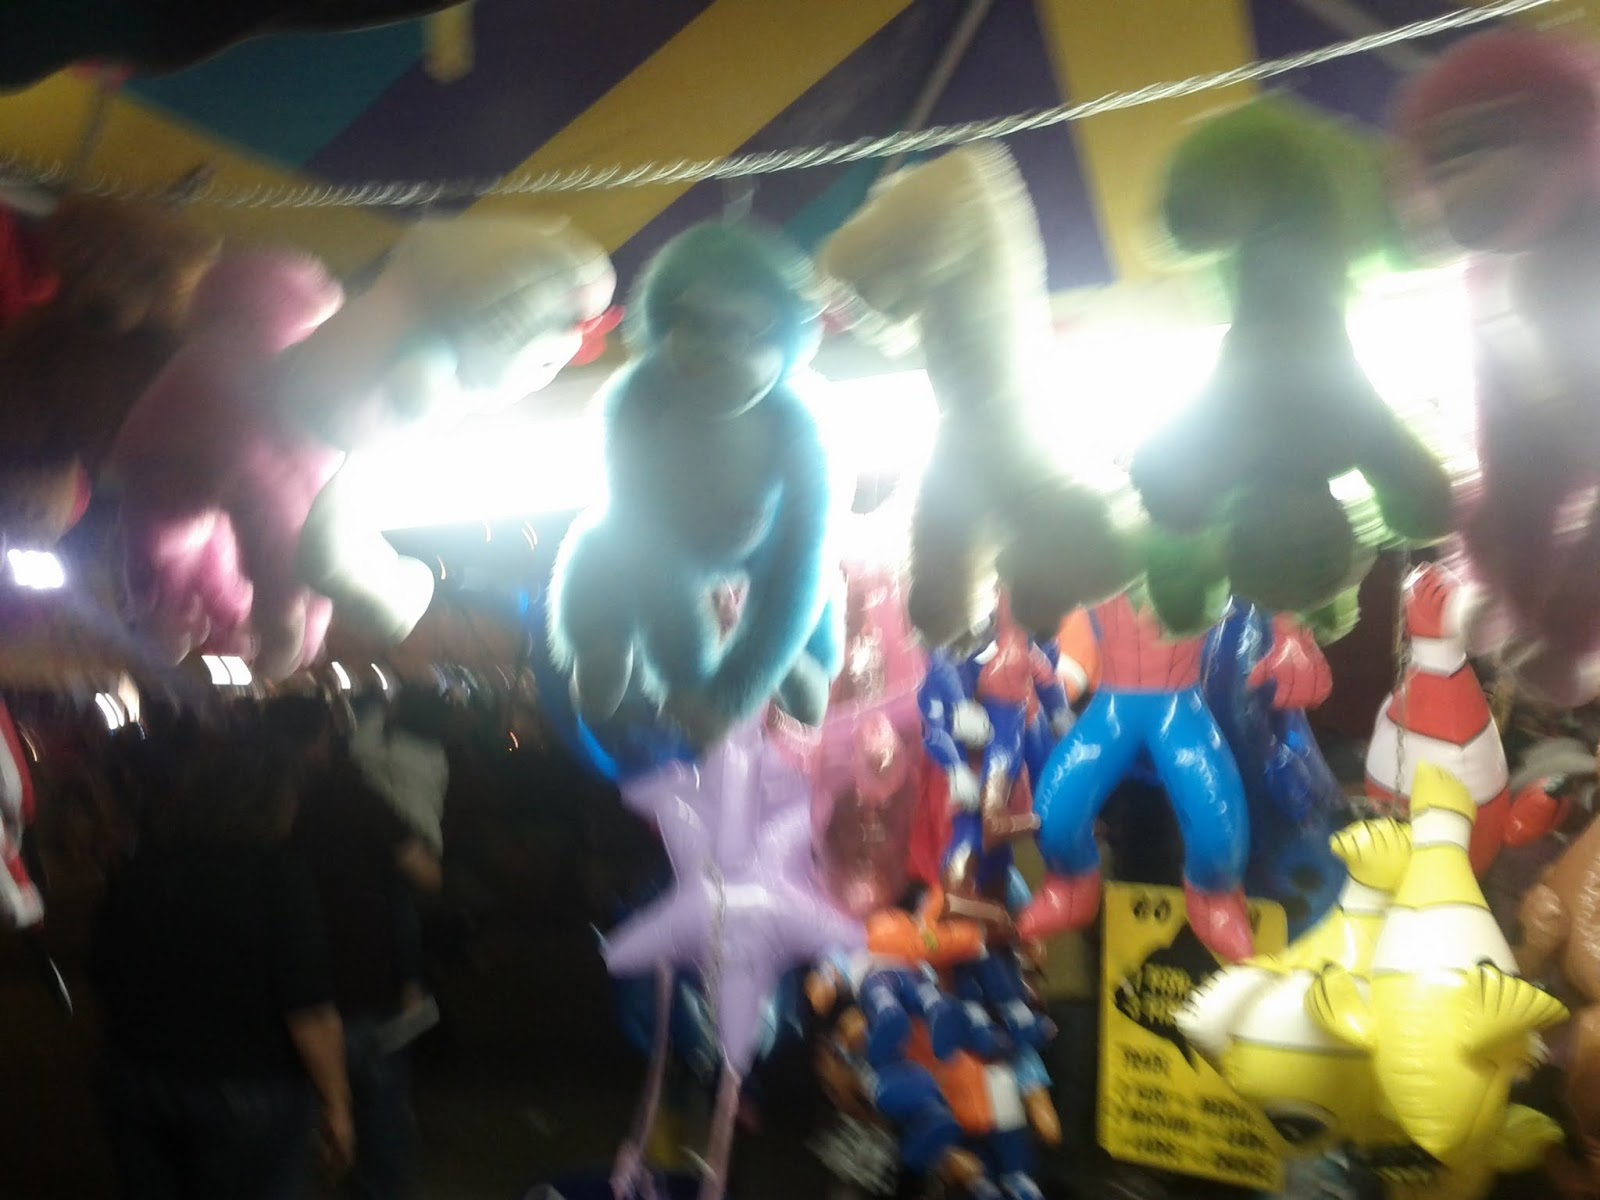 Fort Bend County Fair 2012 - IMG_20121006_202107.jpg